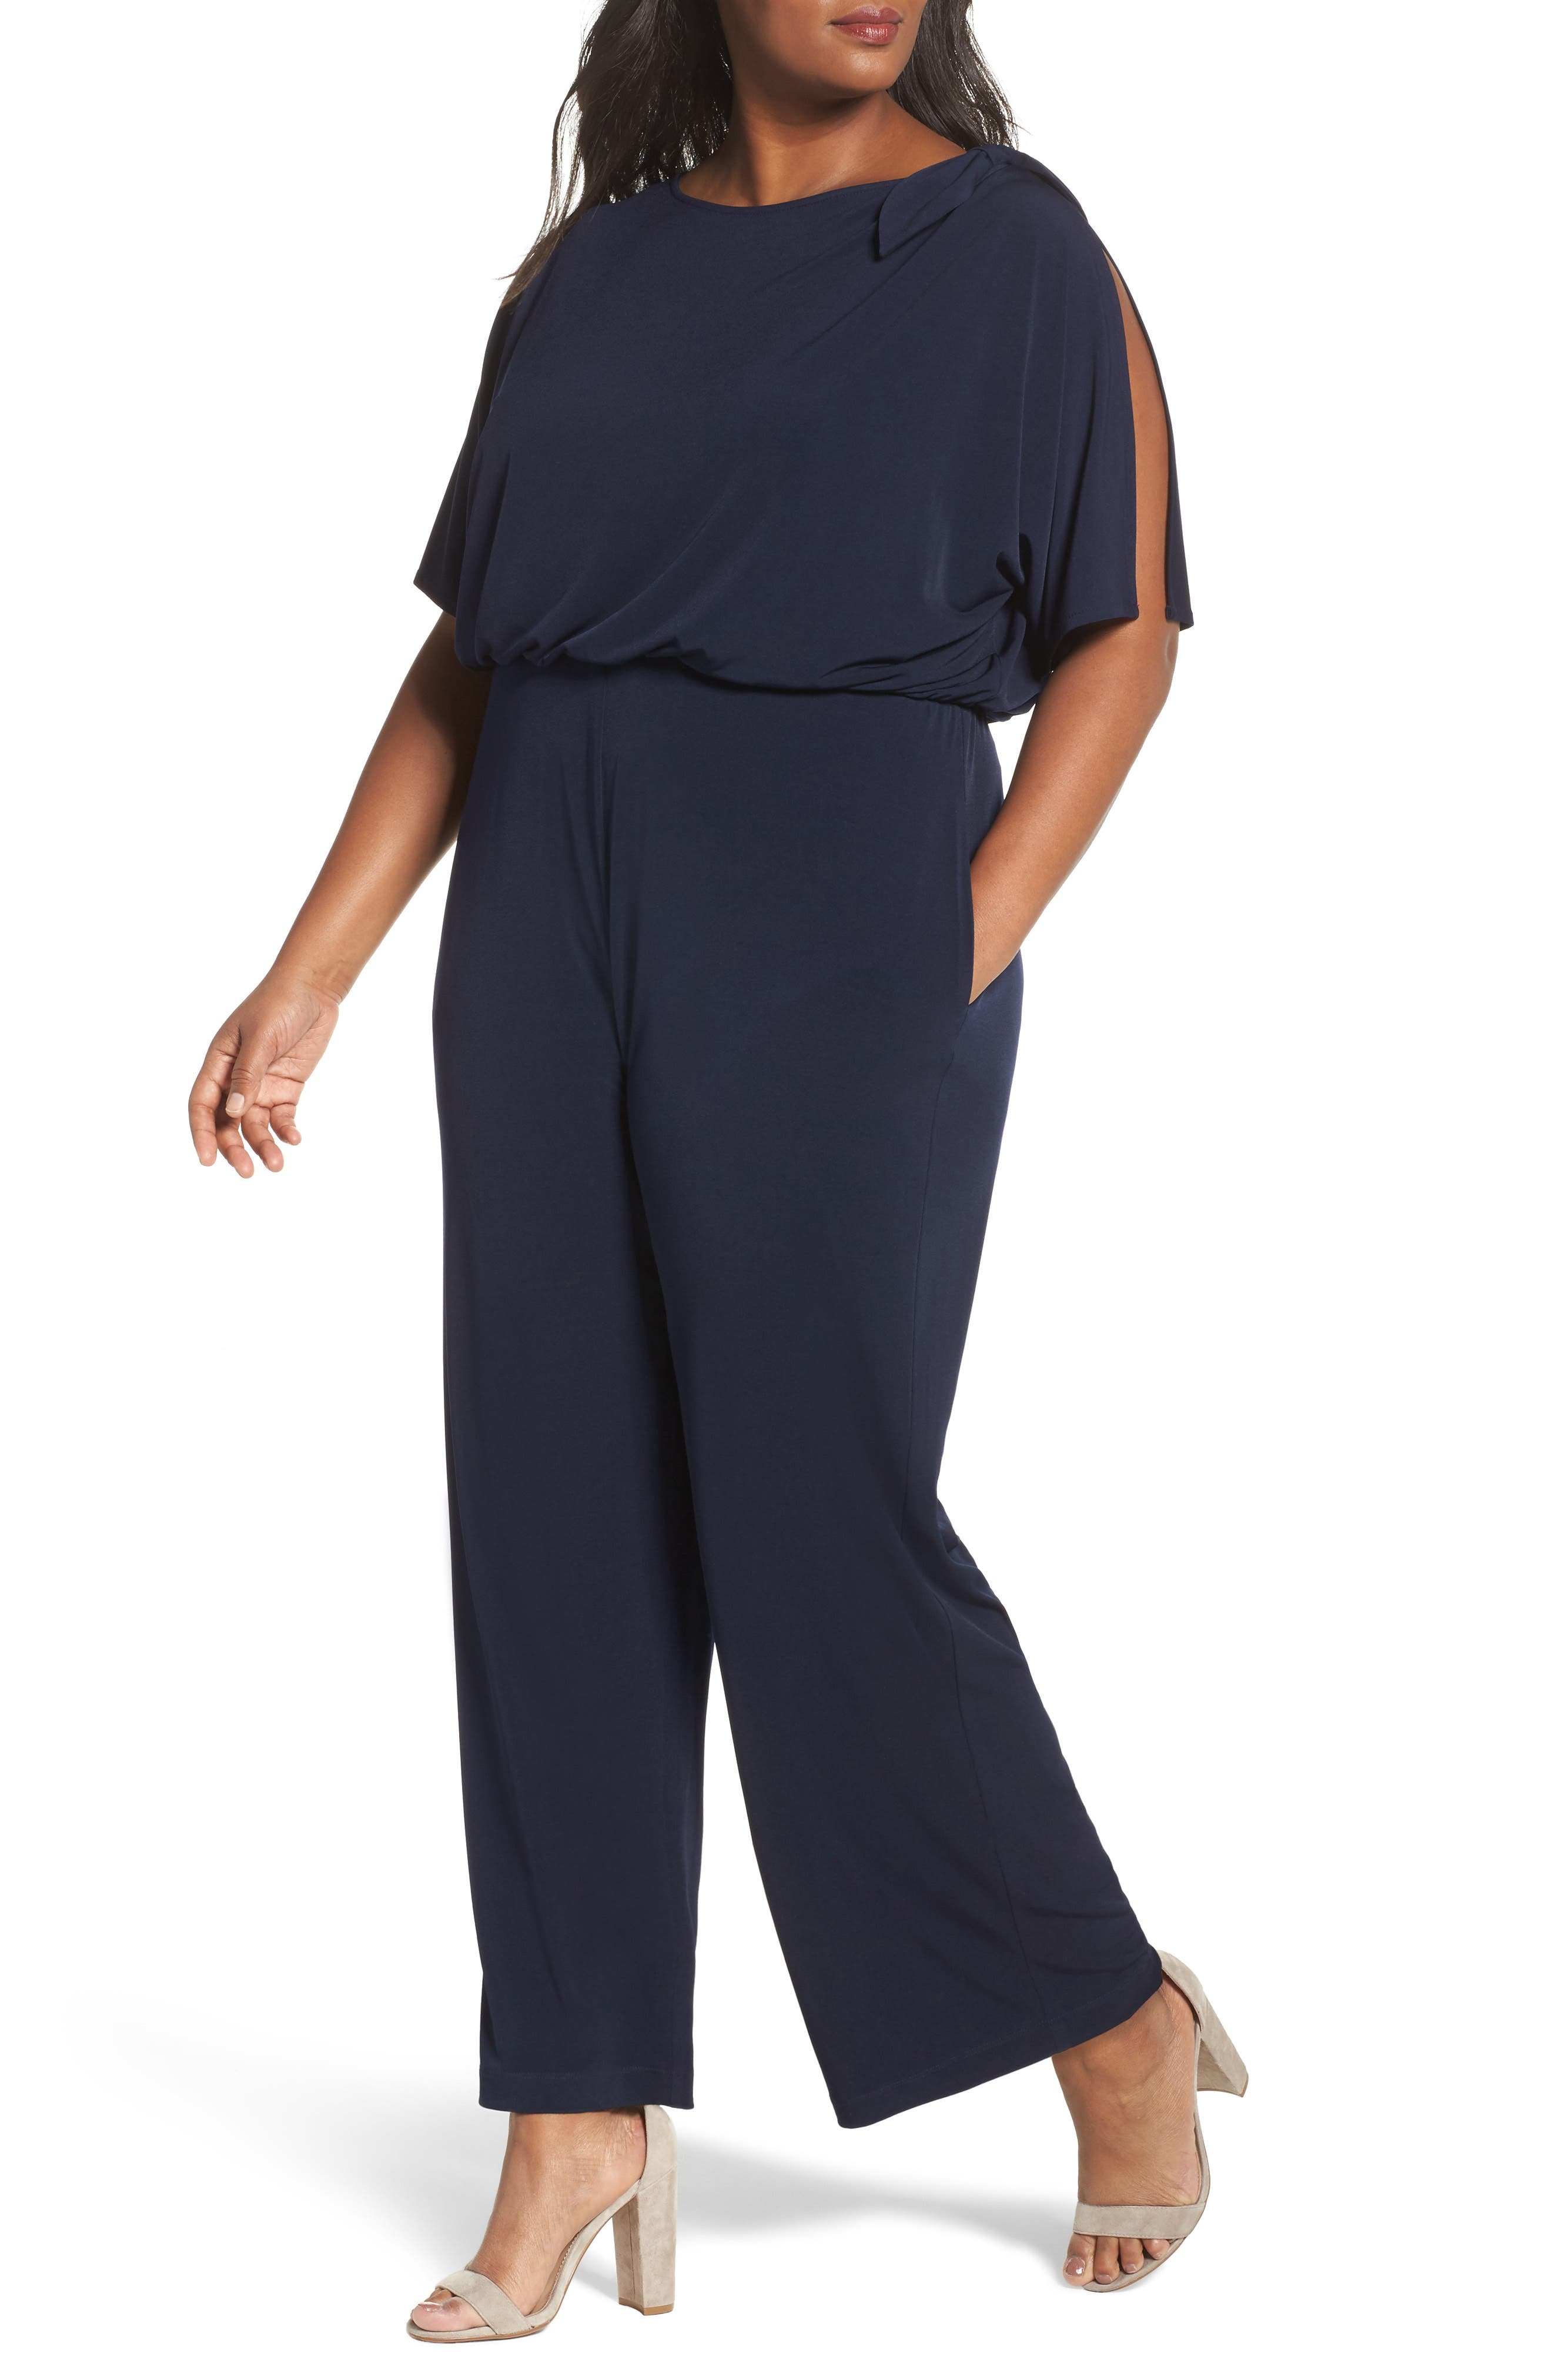 Vince Camuto Crepe Split Sleeve Jumpsuit (Plus Size)